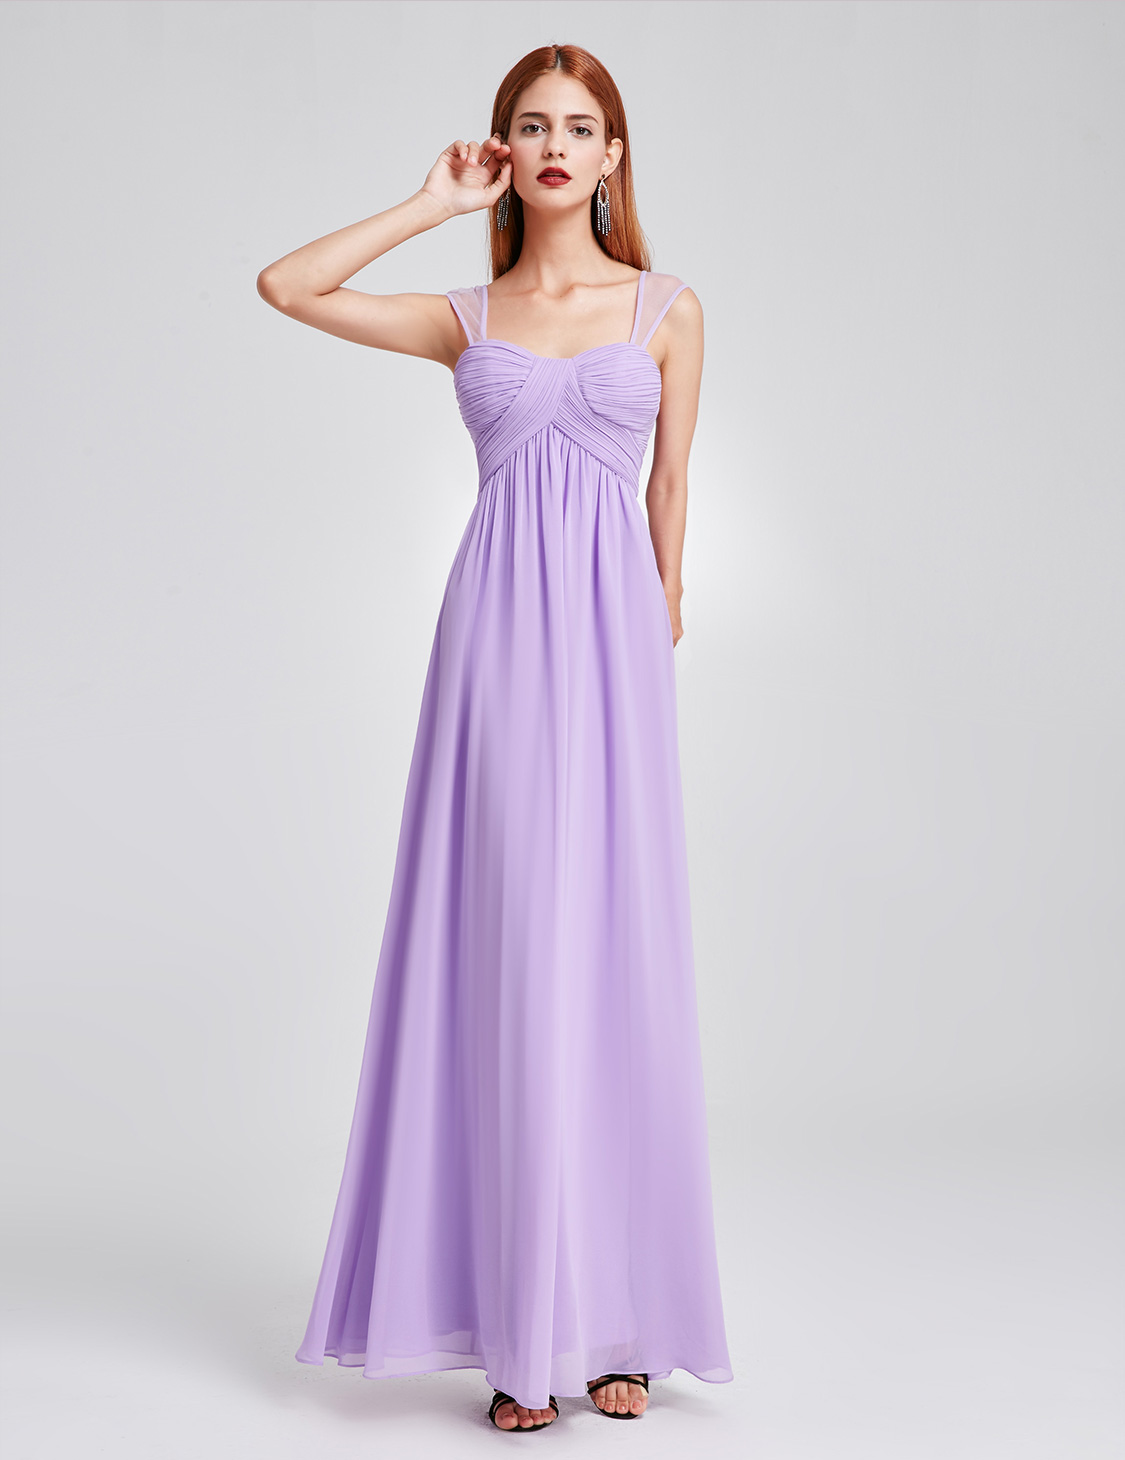 UK Lomg Women Straps Wedding Bridesmaid Dress Evening Ball Gown ...